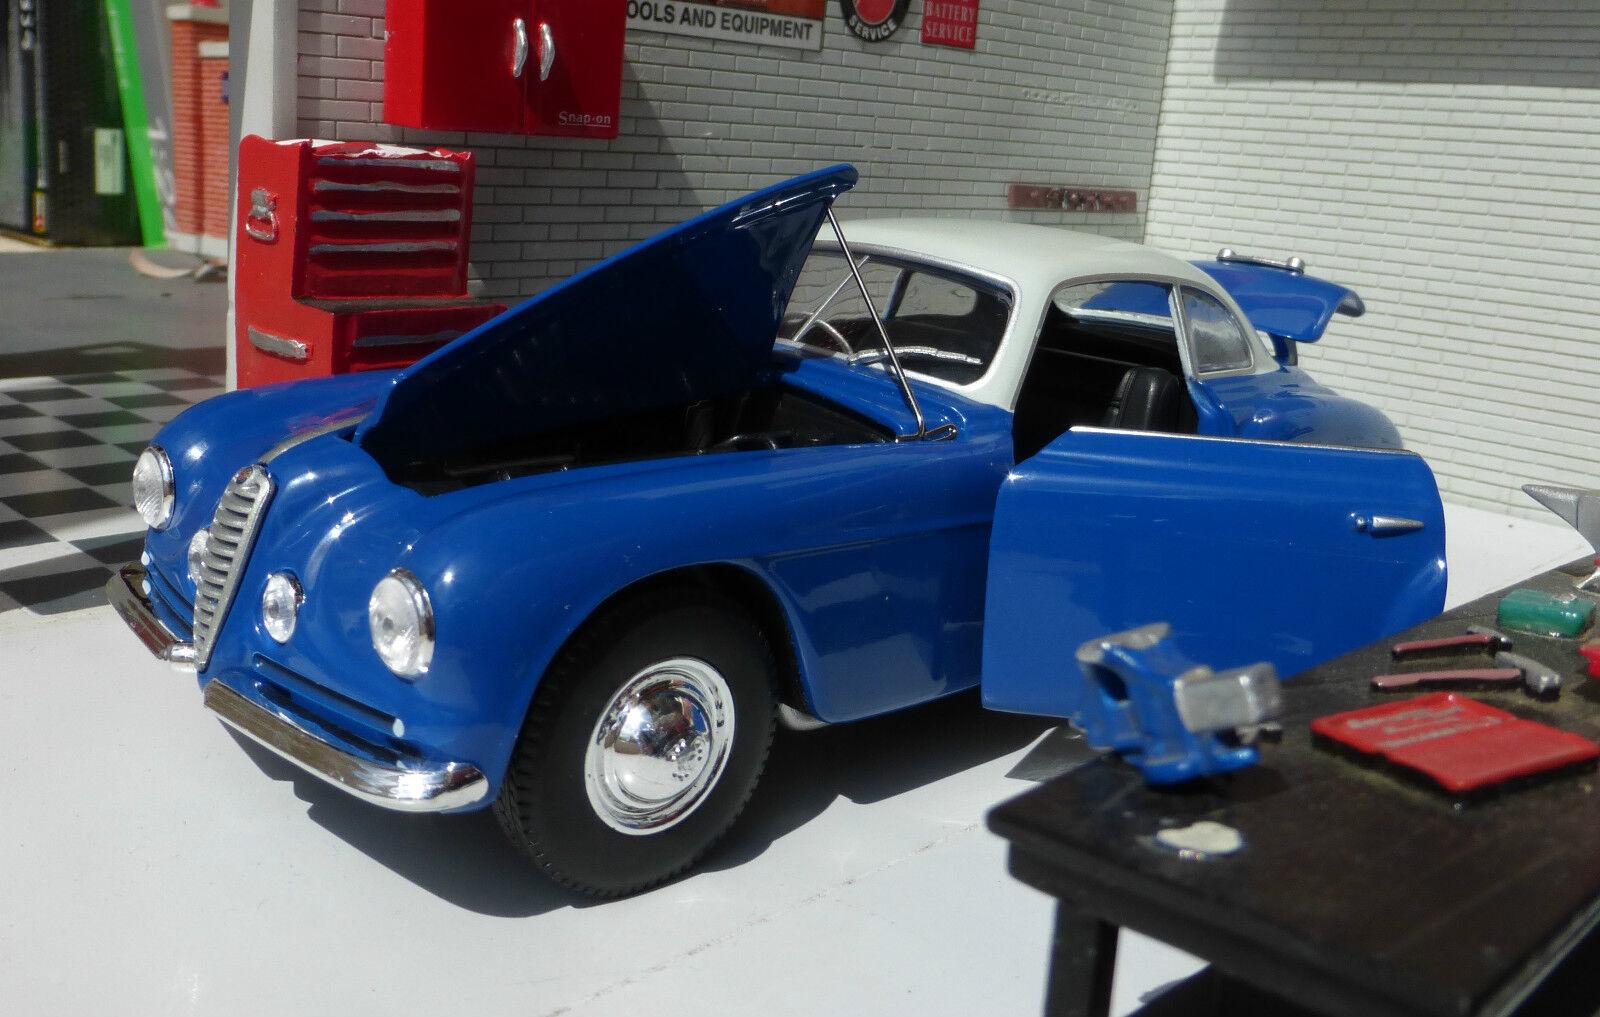 G 24 skala alfa romeo 6c 2500 lsb 1949 blaue Weißbox druckguss detaillierte modell